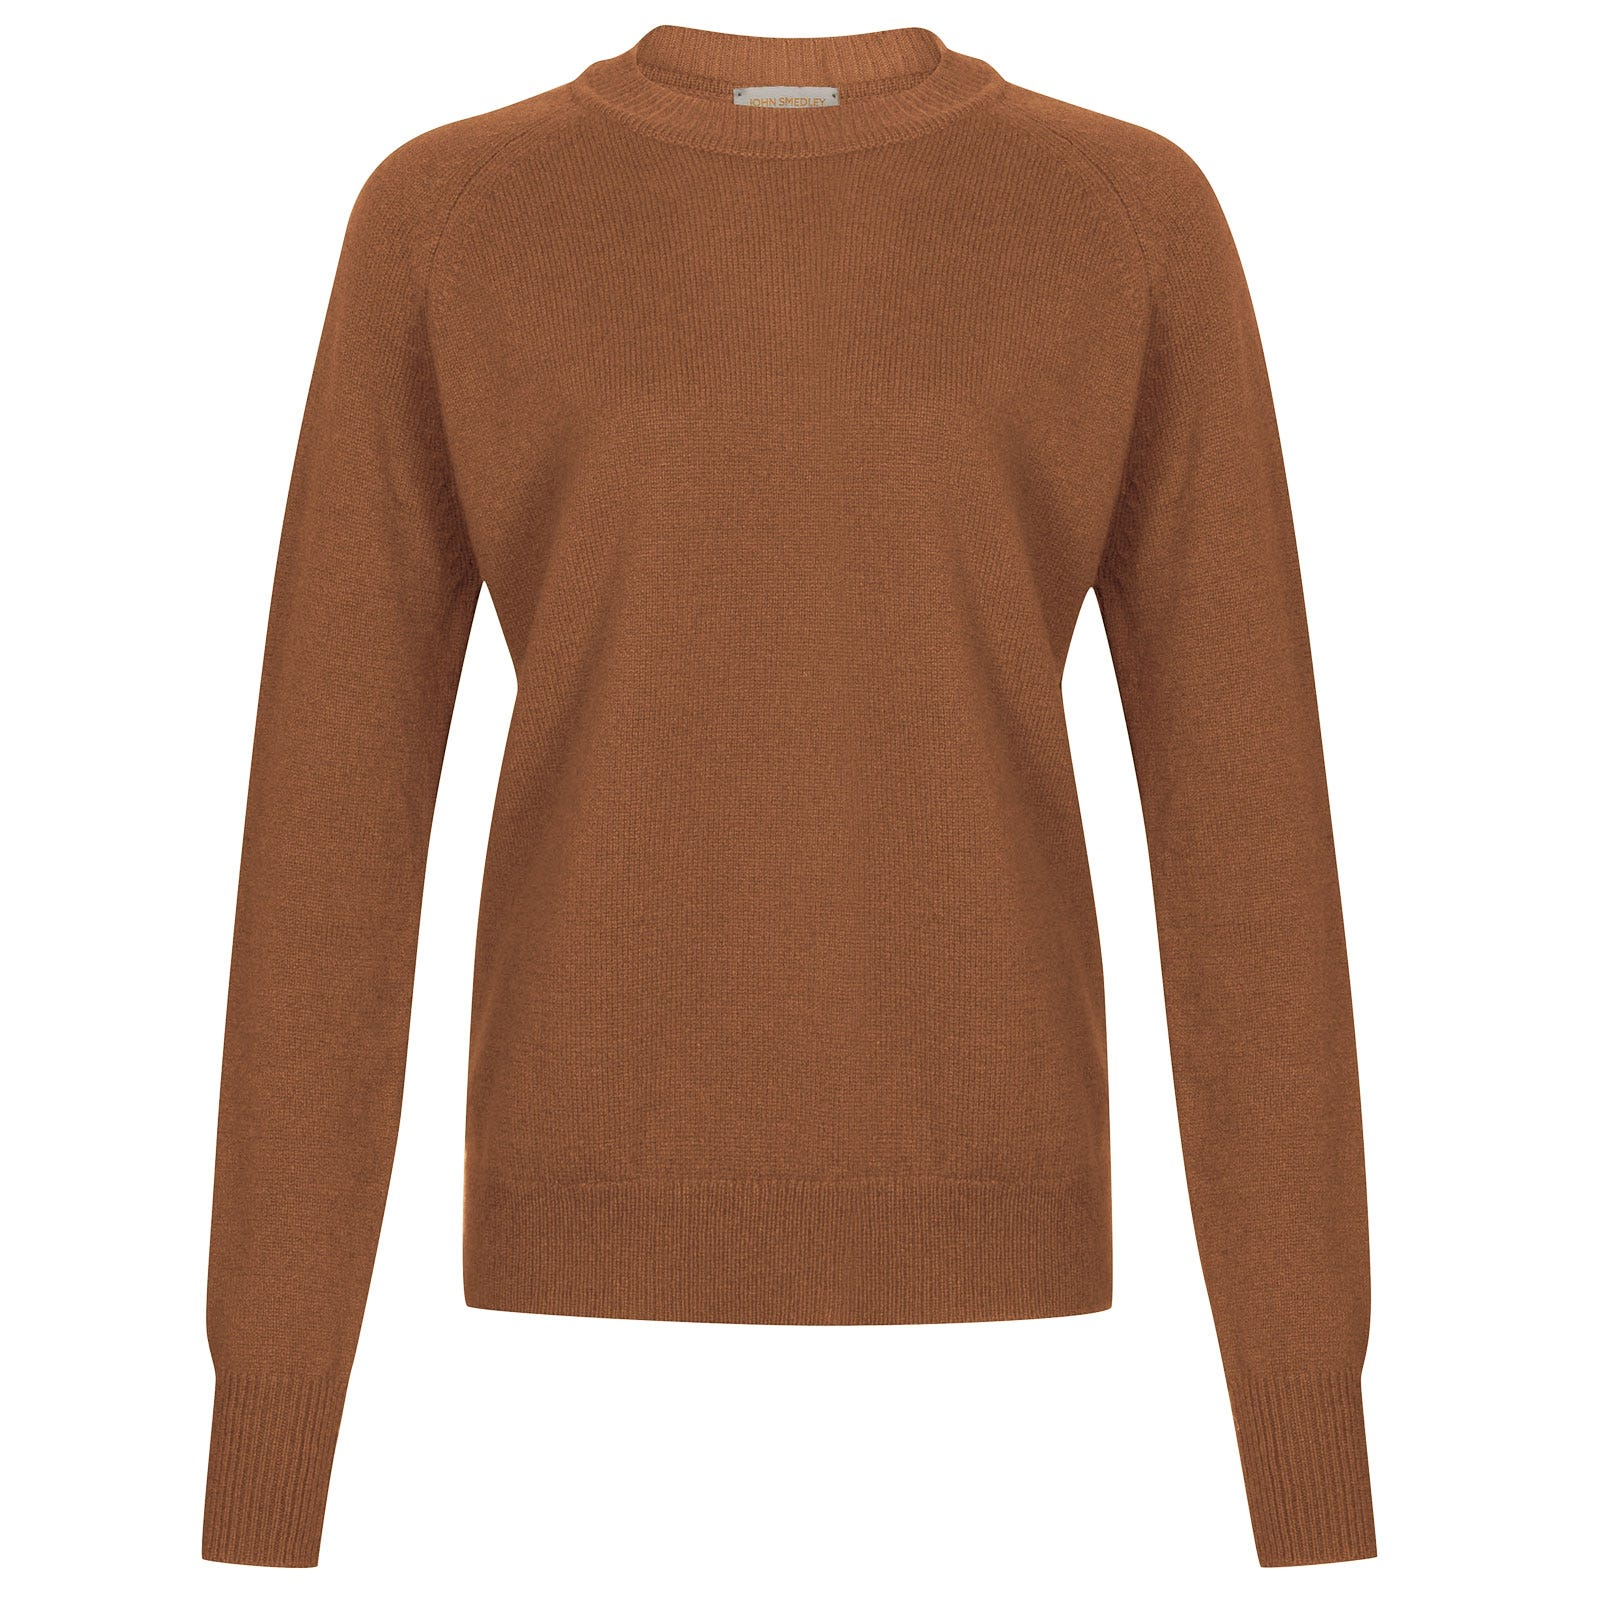 John Smedley dillon Merino Wool & Cashmere Sweater in Camel-XL